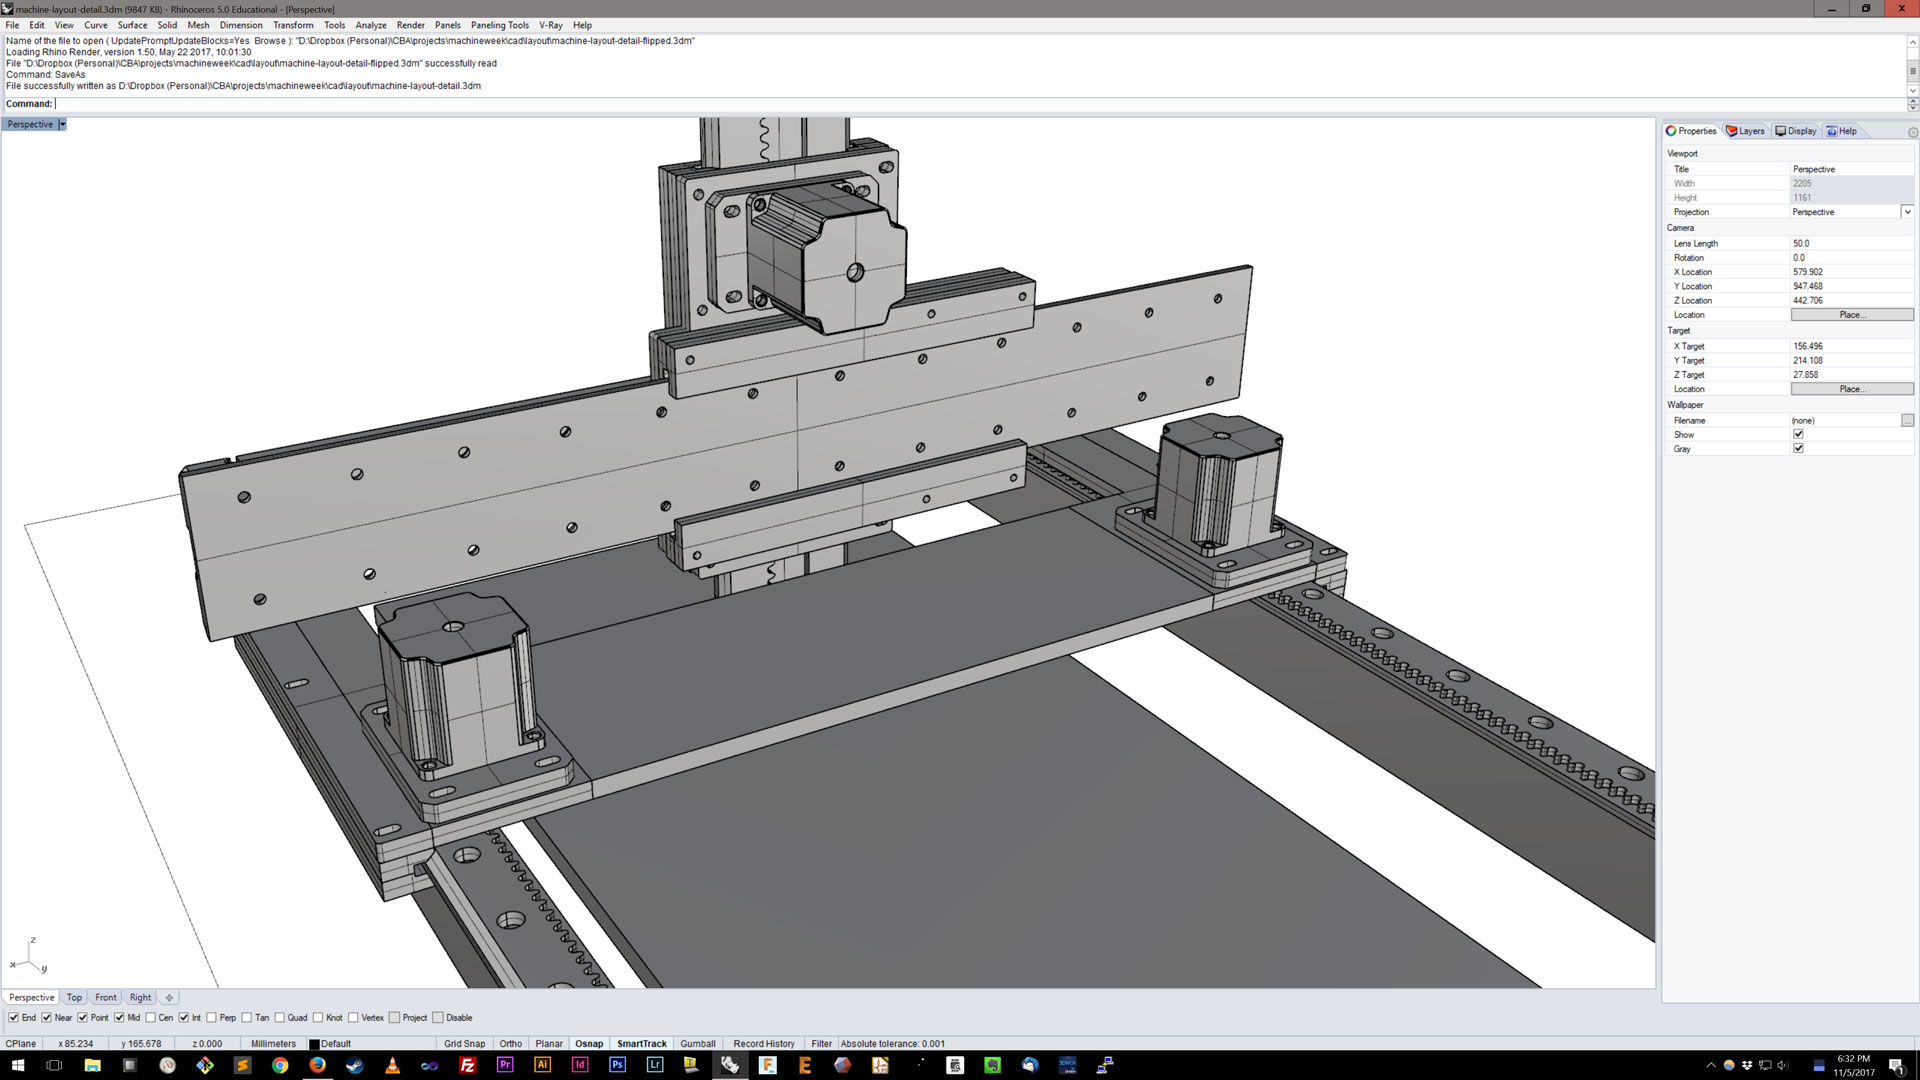 images/layout-pre-box-y.jpg